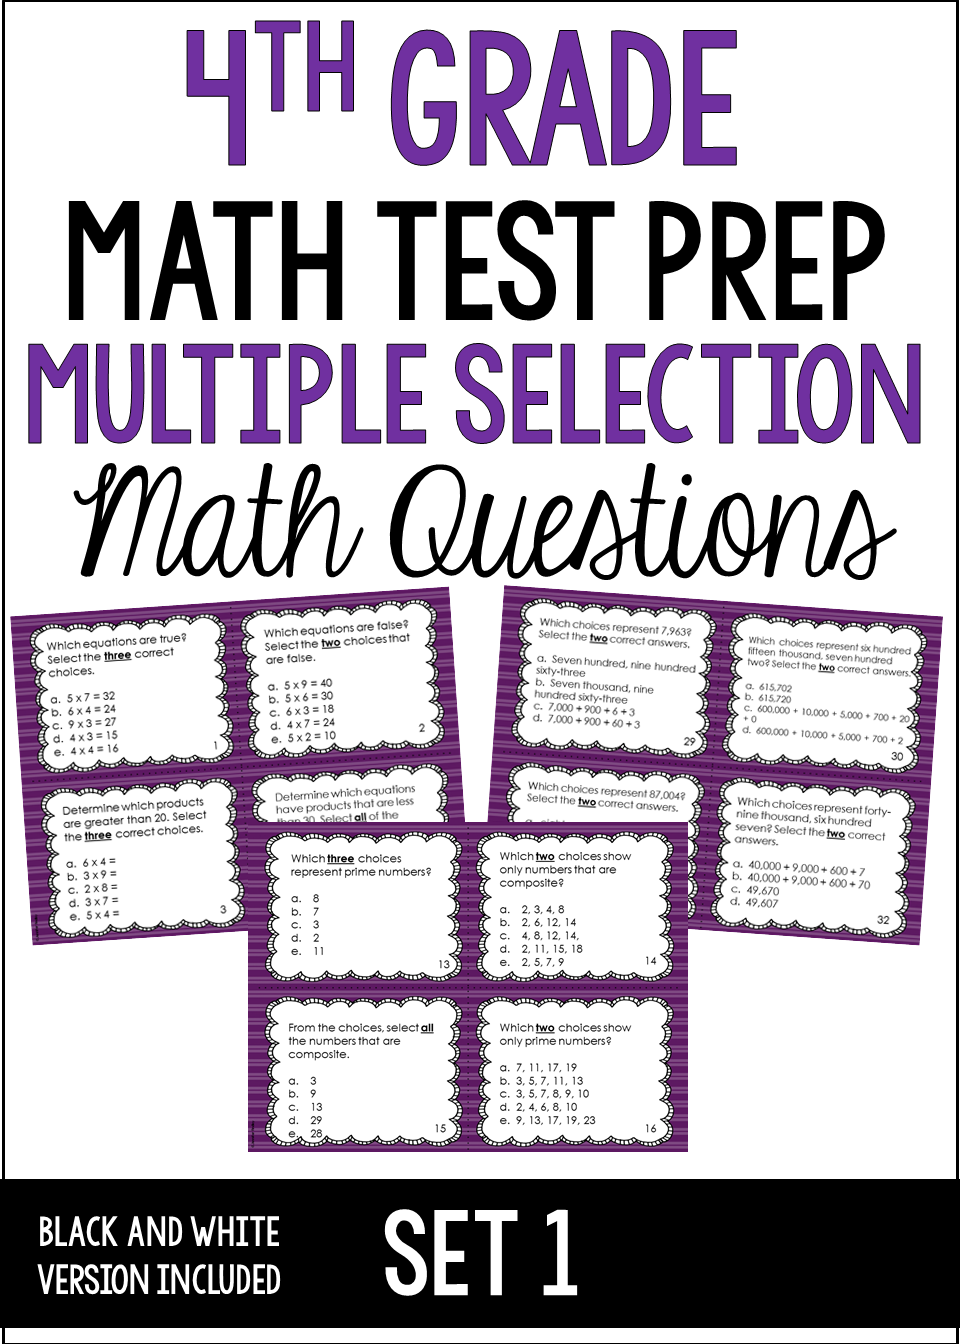 4th Grade Math Test Prep: Multiple Select Questions (Set 1) | Math ...